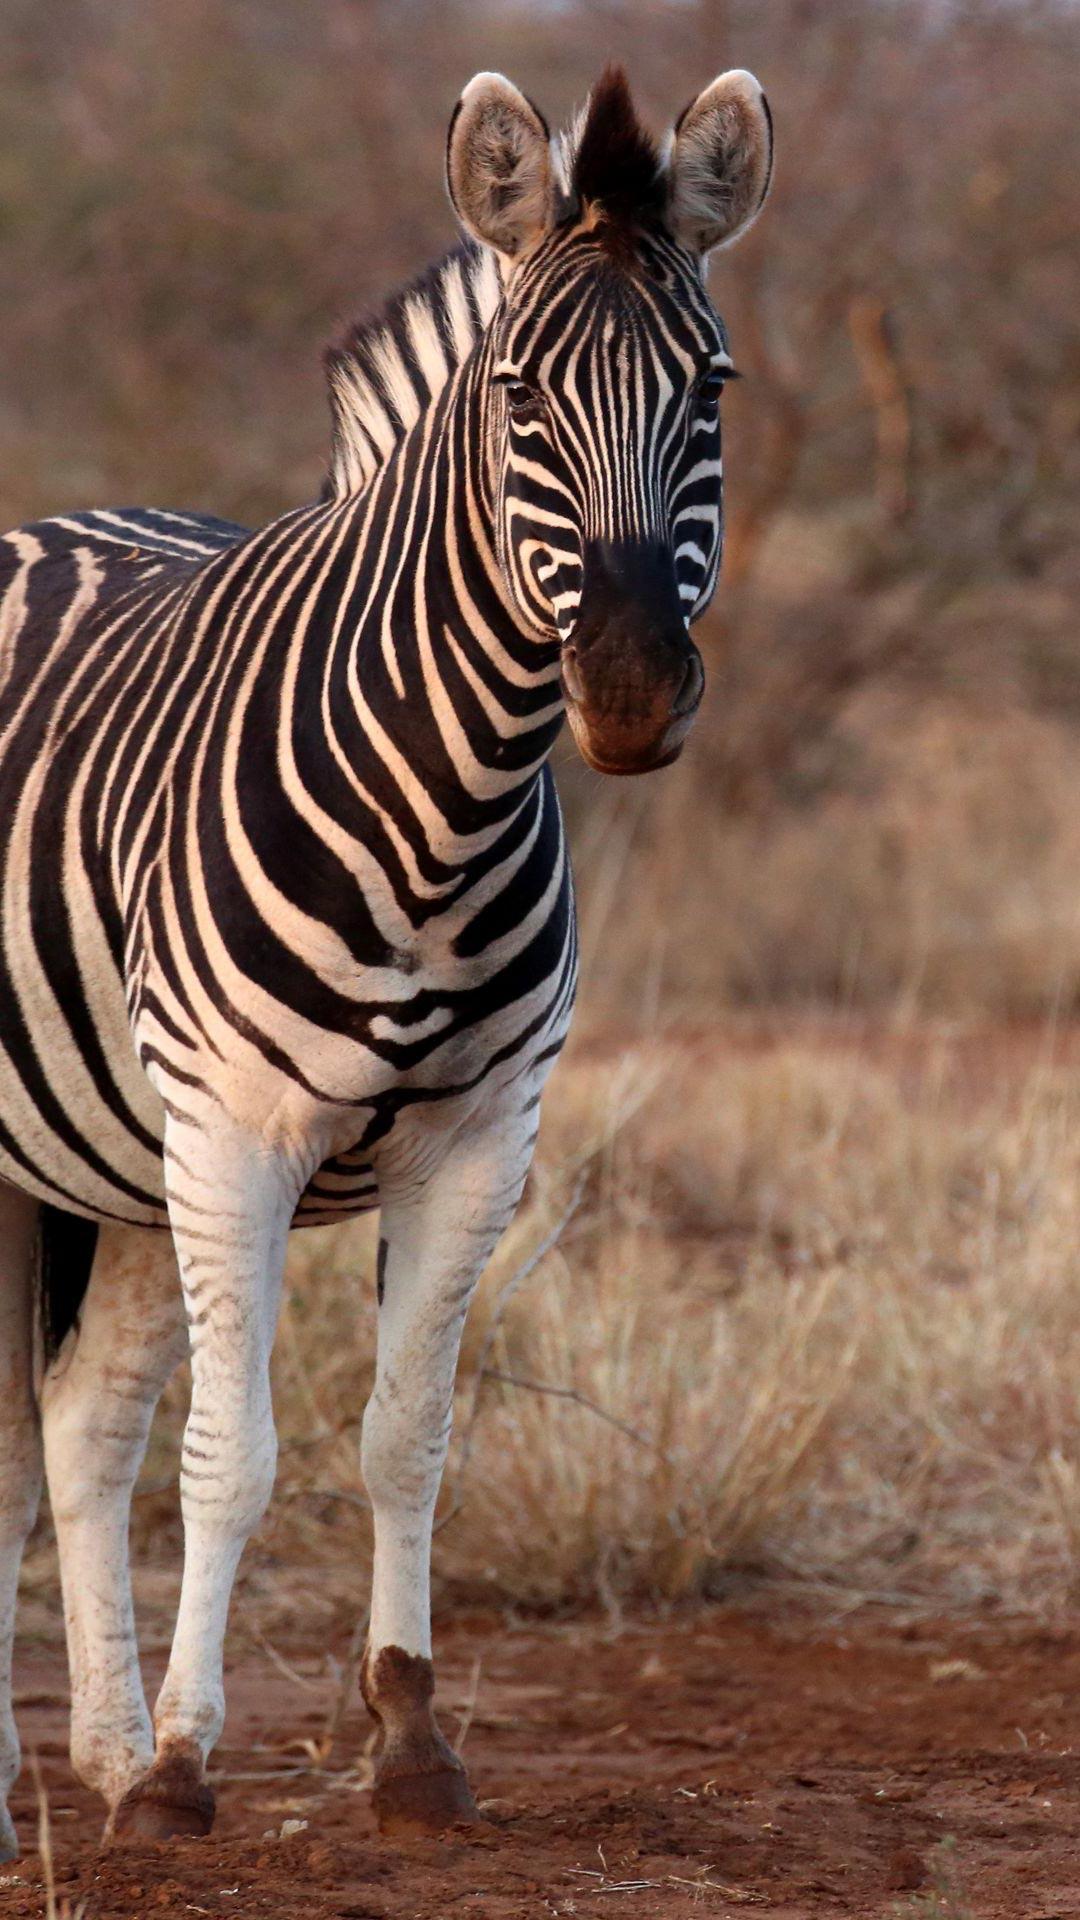 Zebra, Africa, Wildlife, Safari